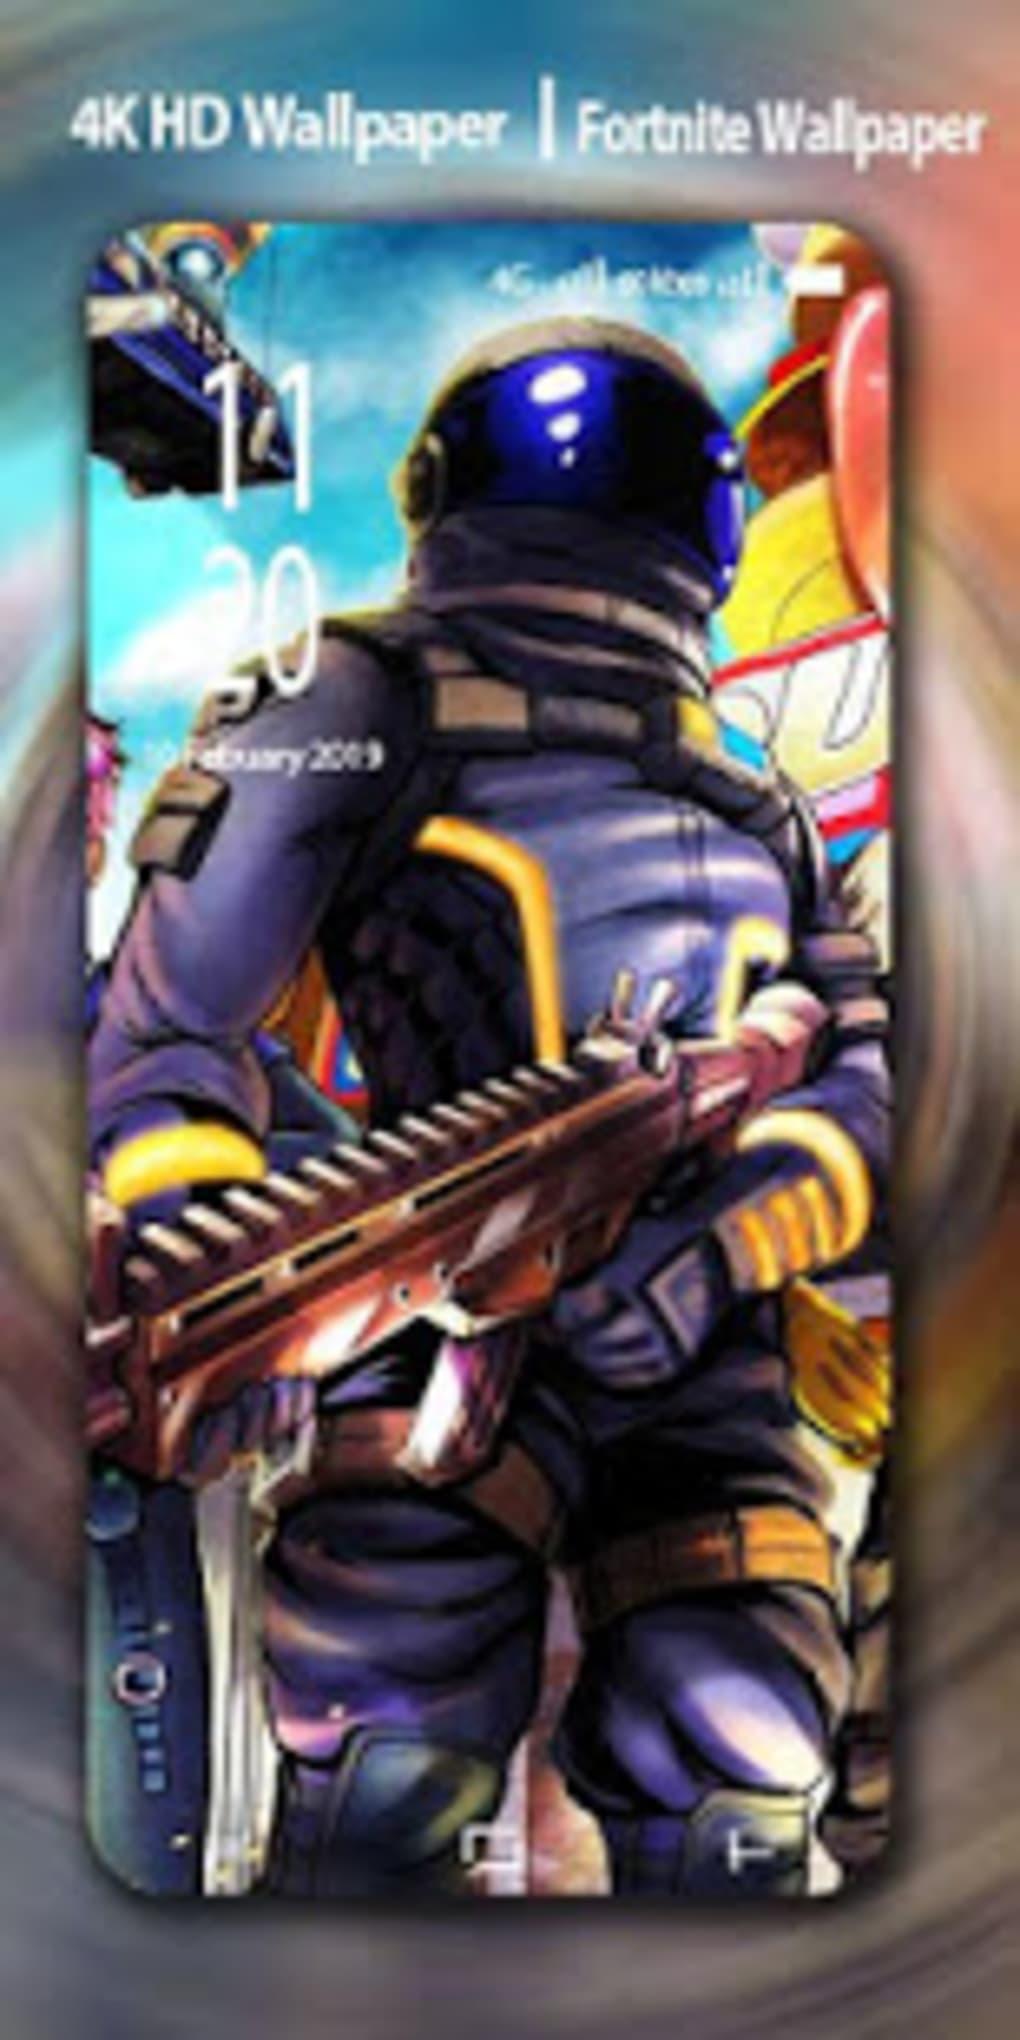 Battle Royale Wallpaper All Season Fortfan 4k Hd For Android